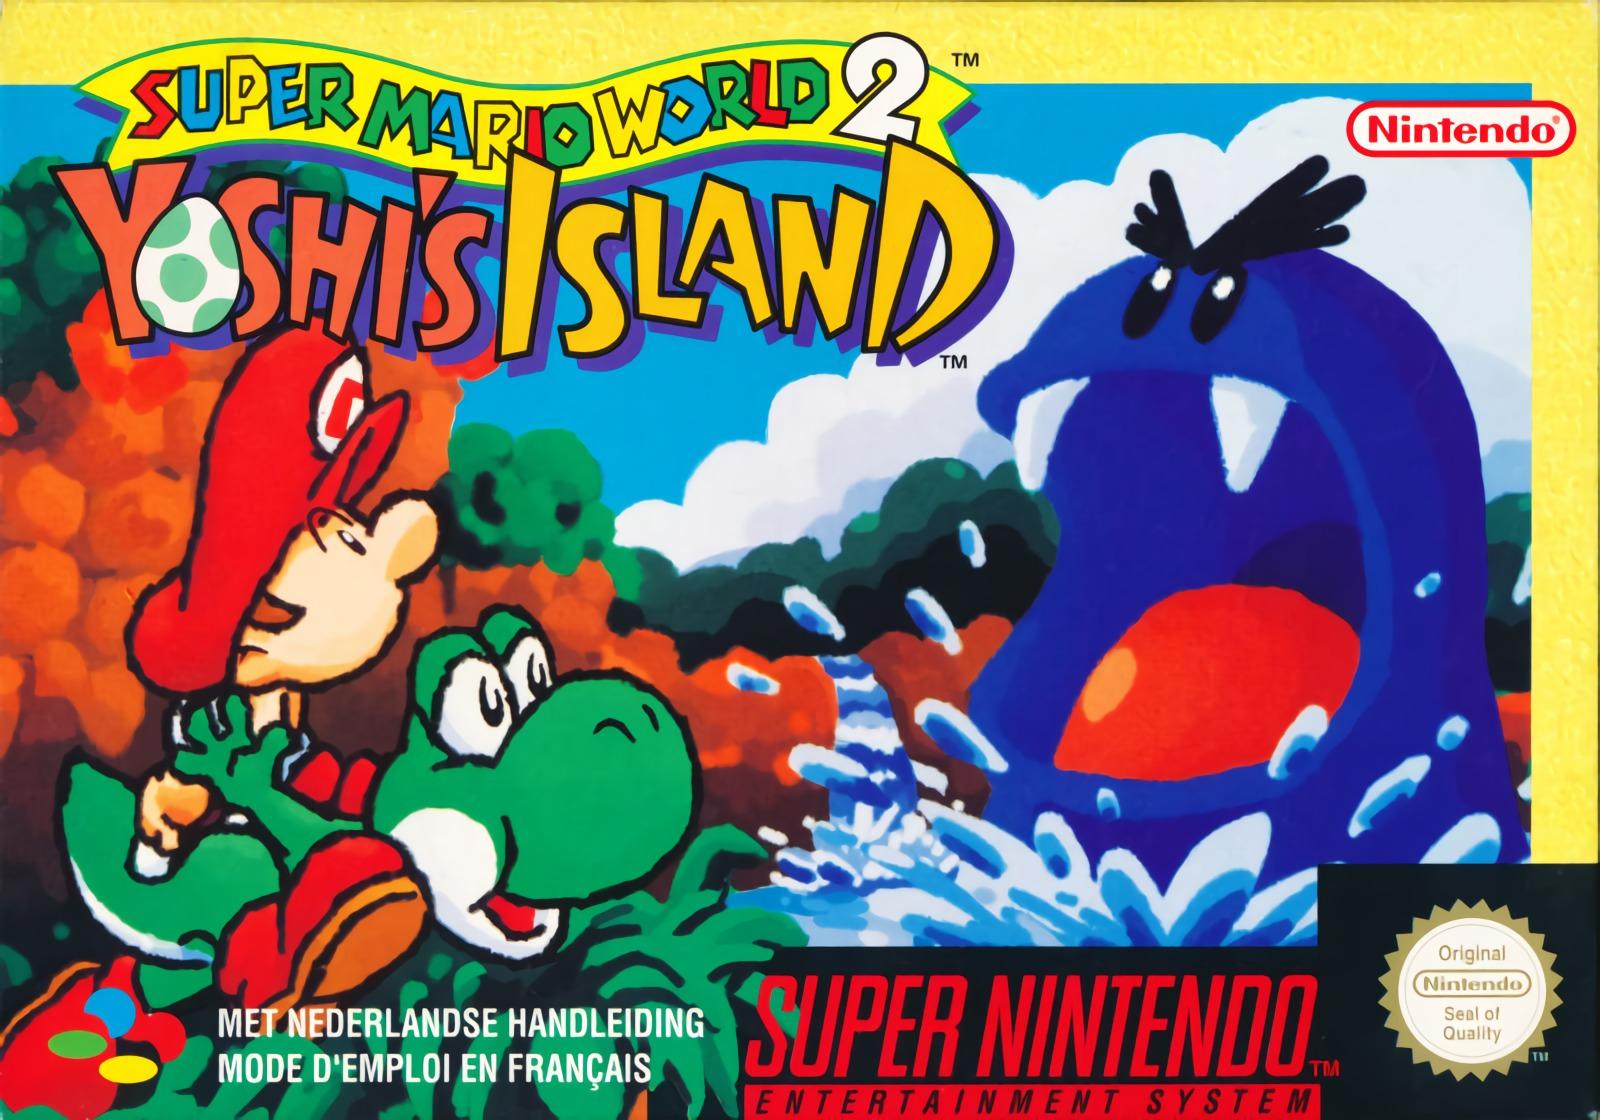 super mario world 2 yoshi's island  télécharger rom iso